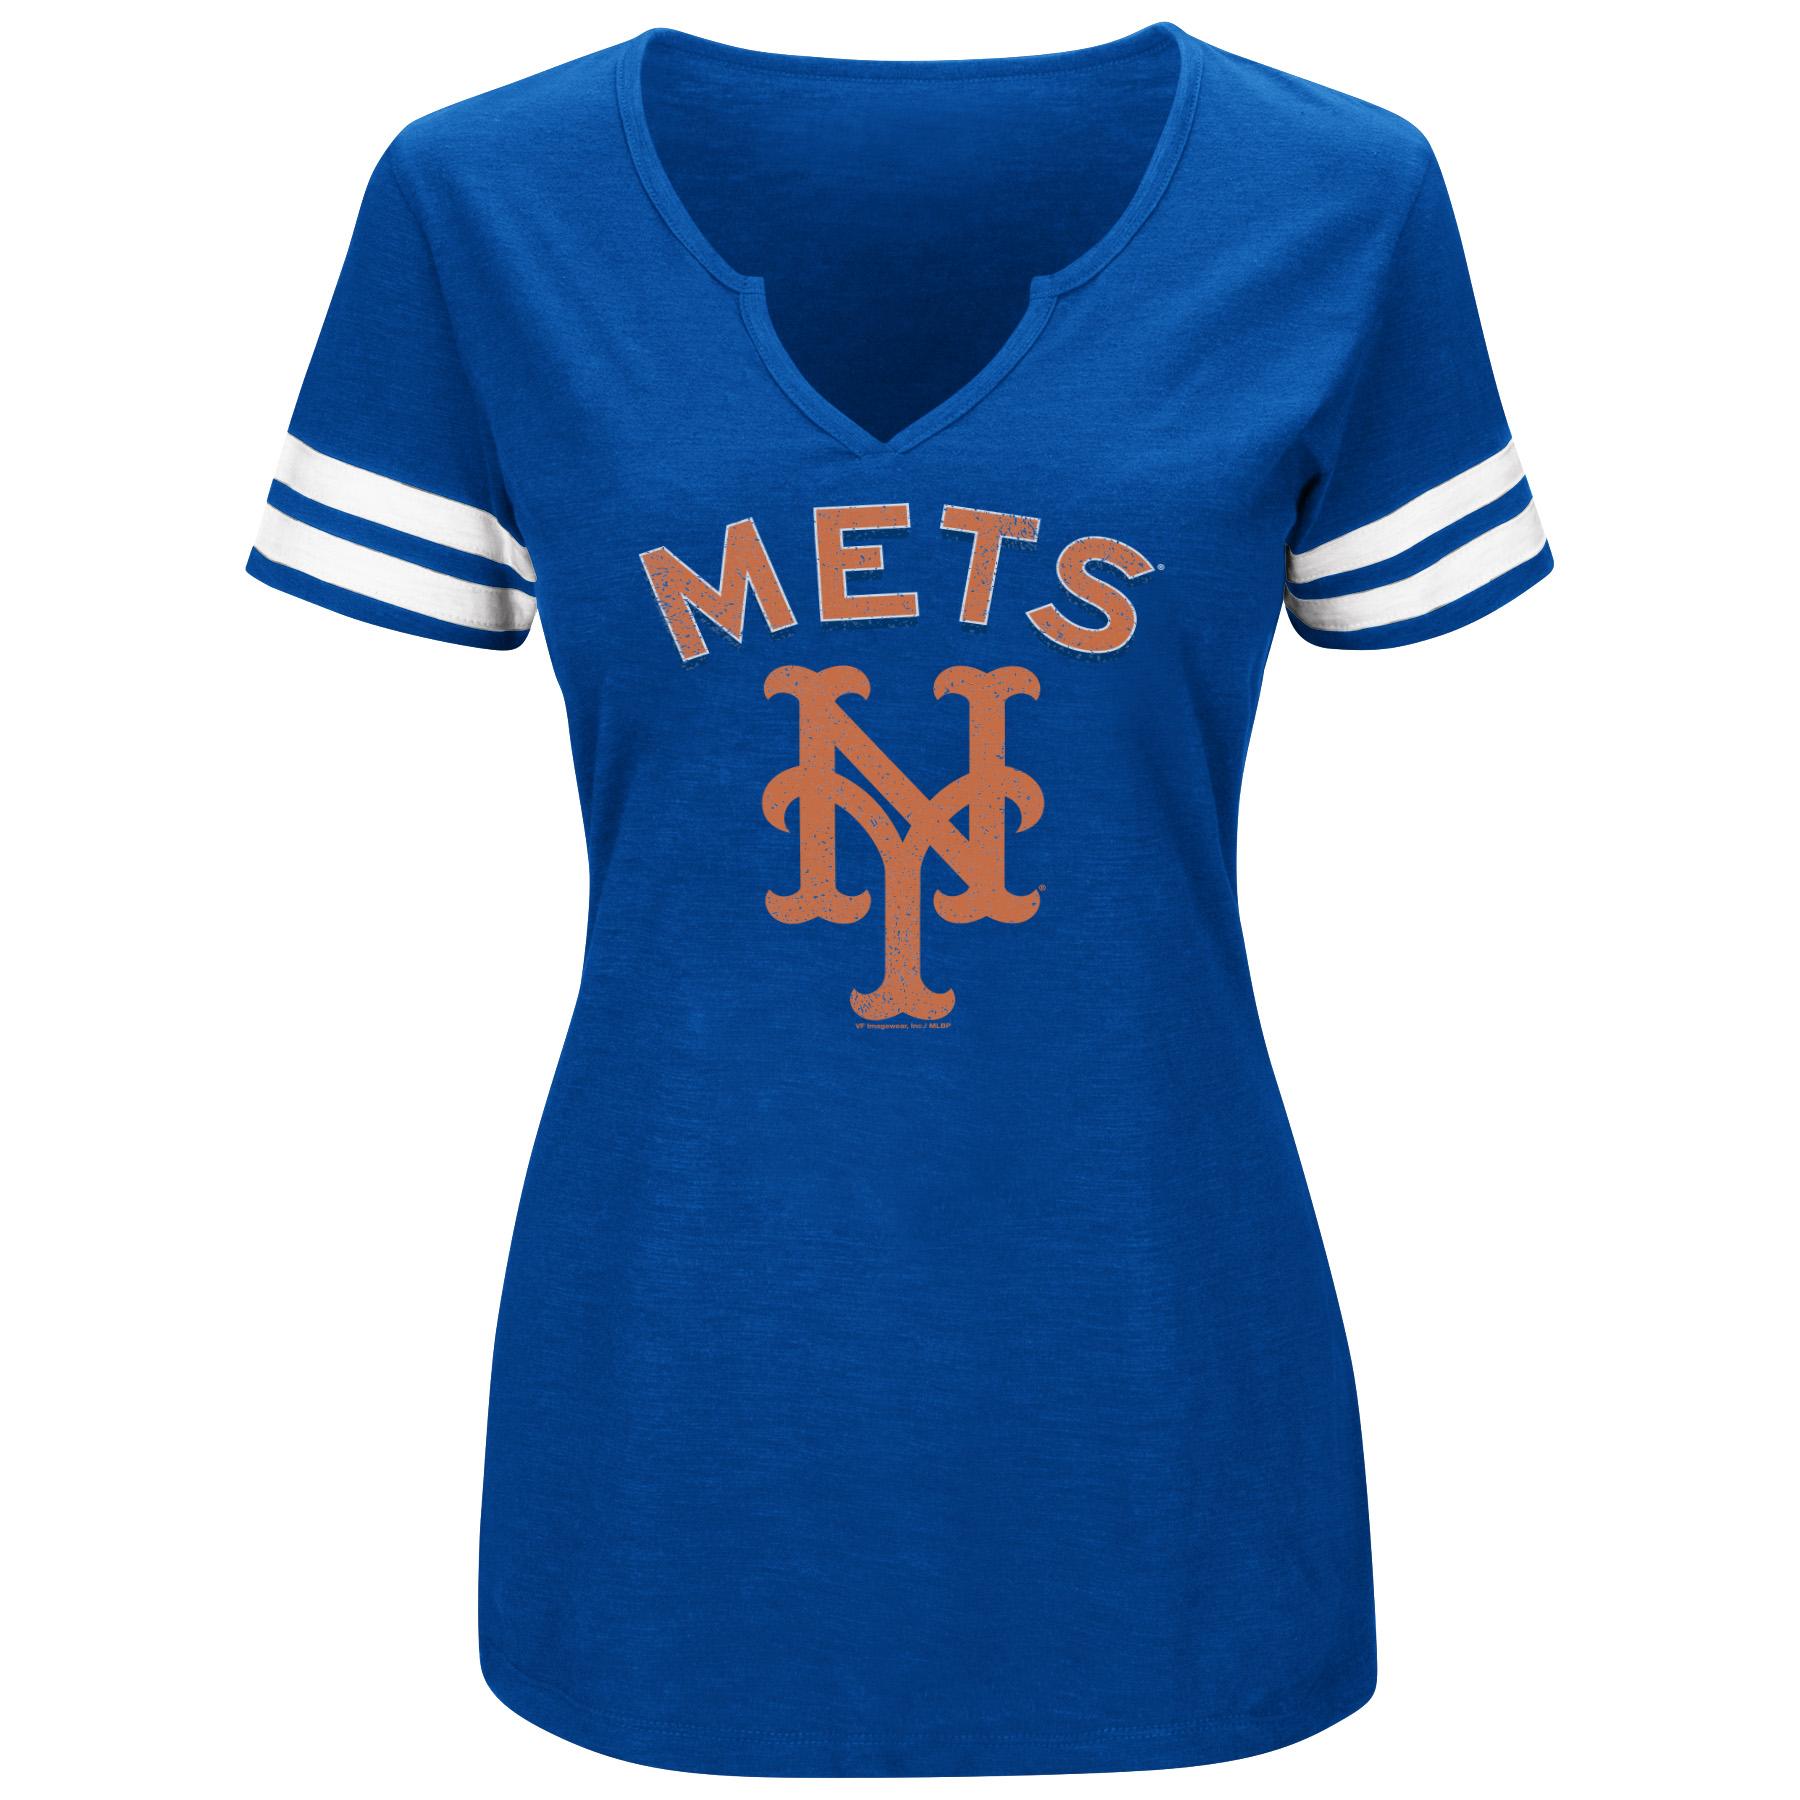 Women's Majestic Royal/White New York Mets Decisive Moment V-Notch T-Shirt